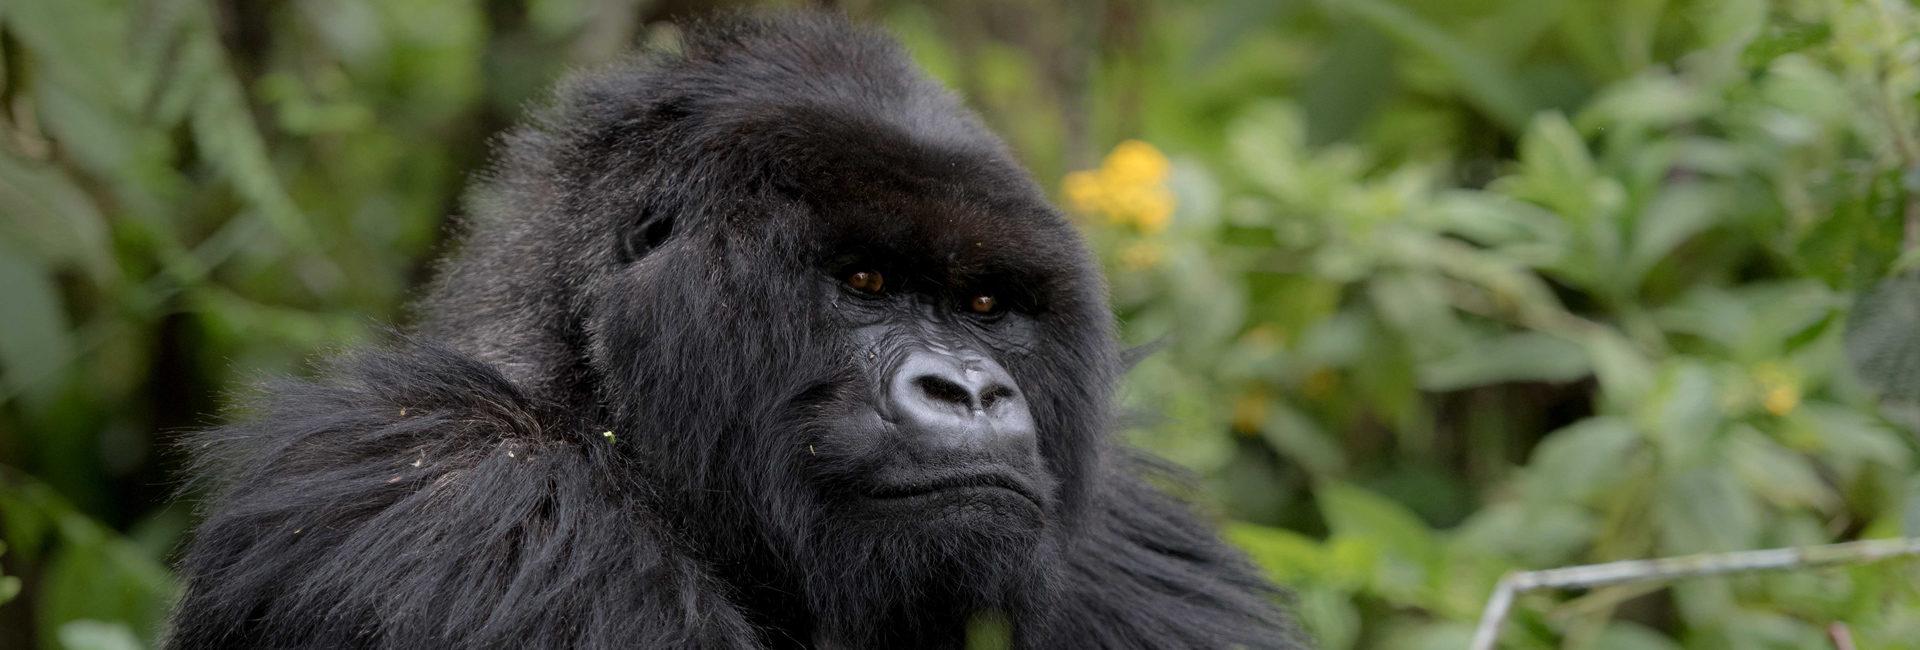 Get up close to Gorillas